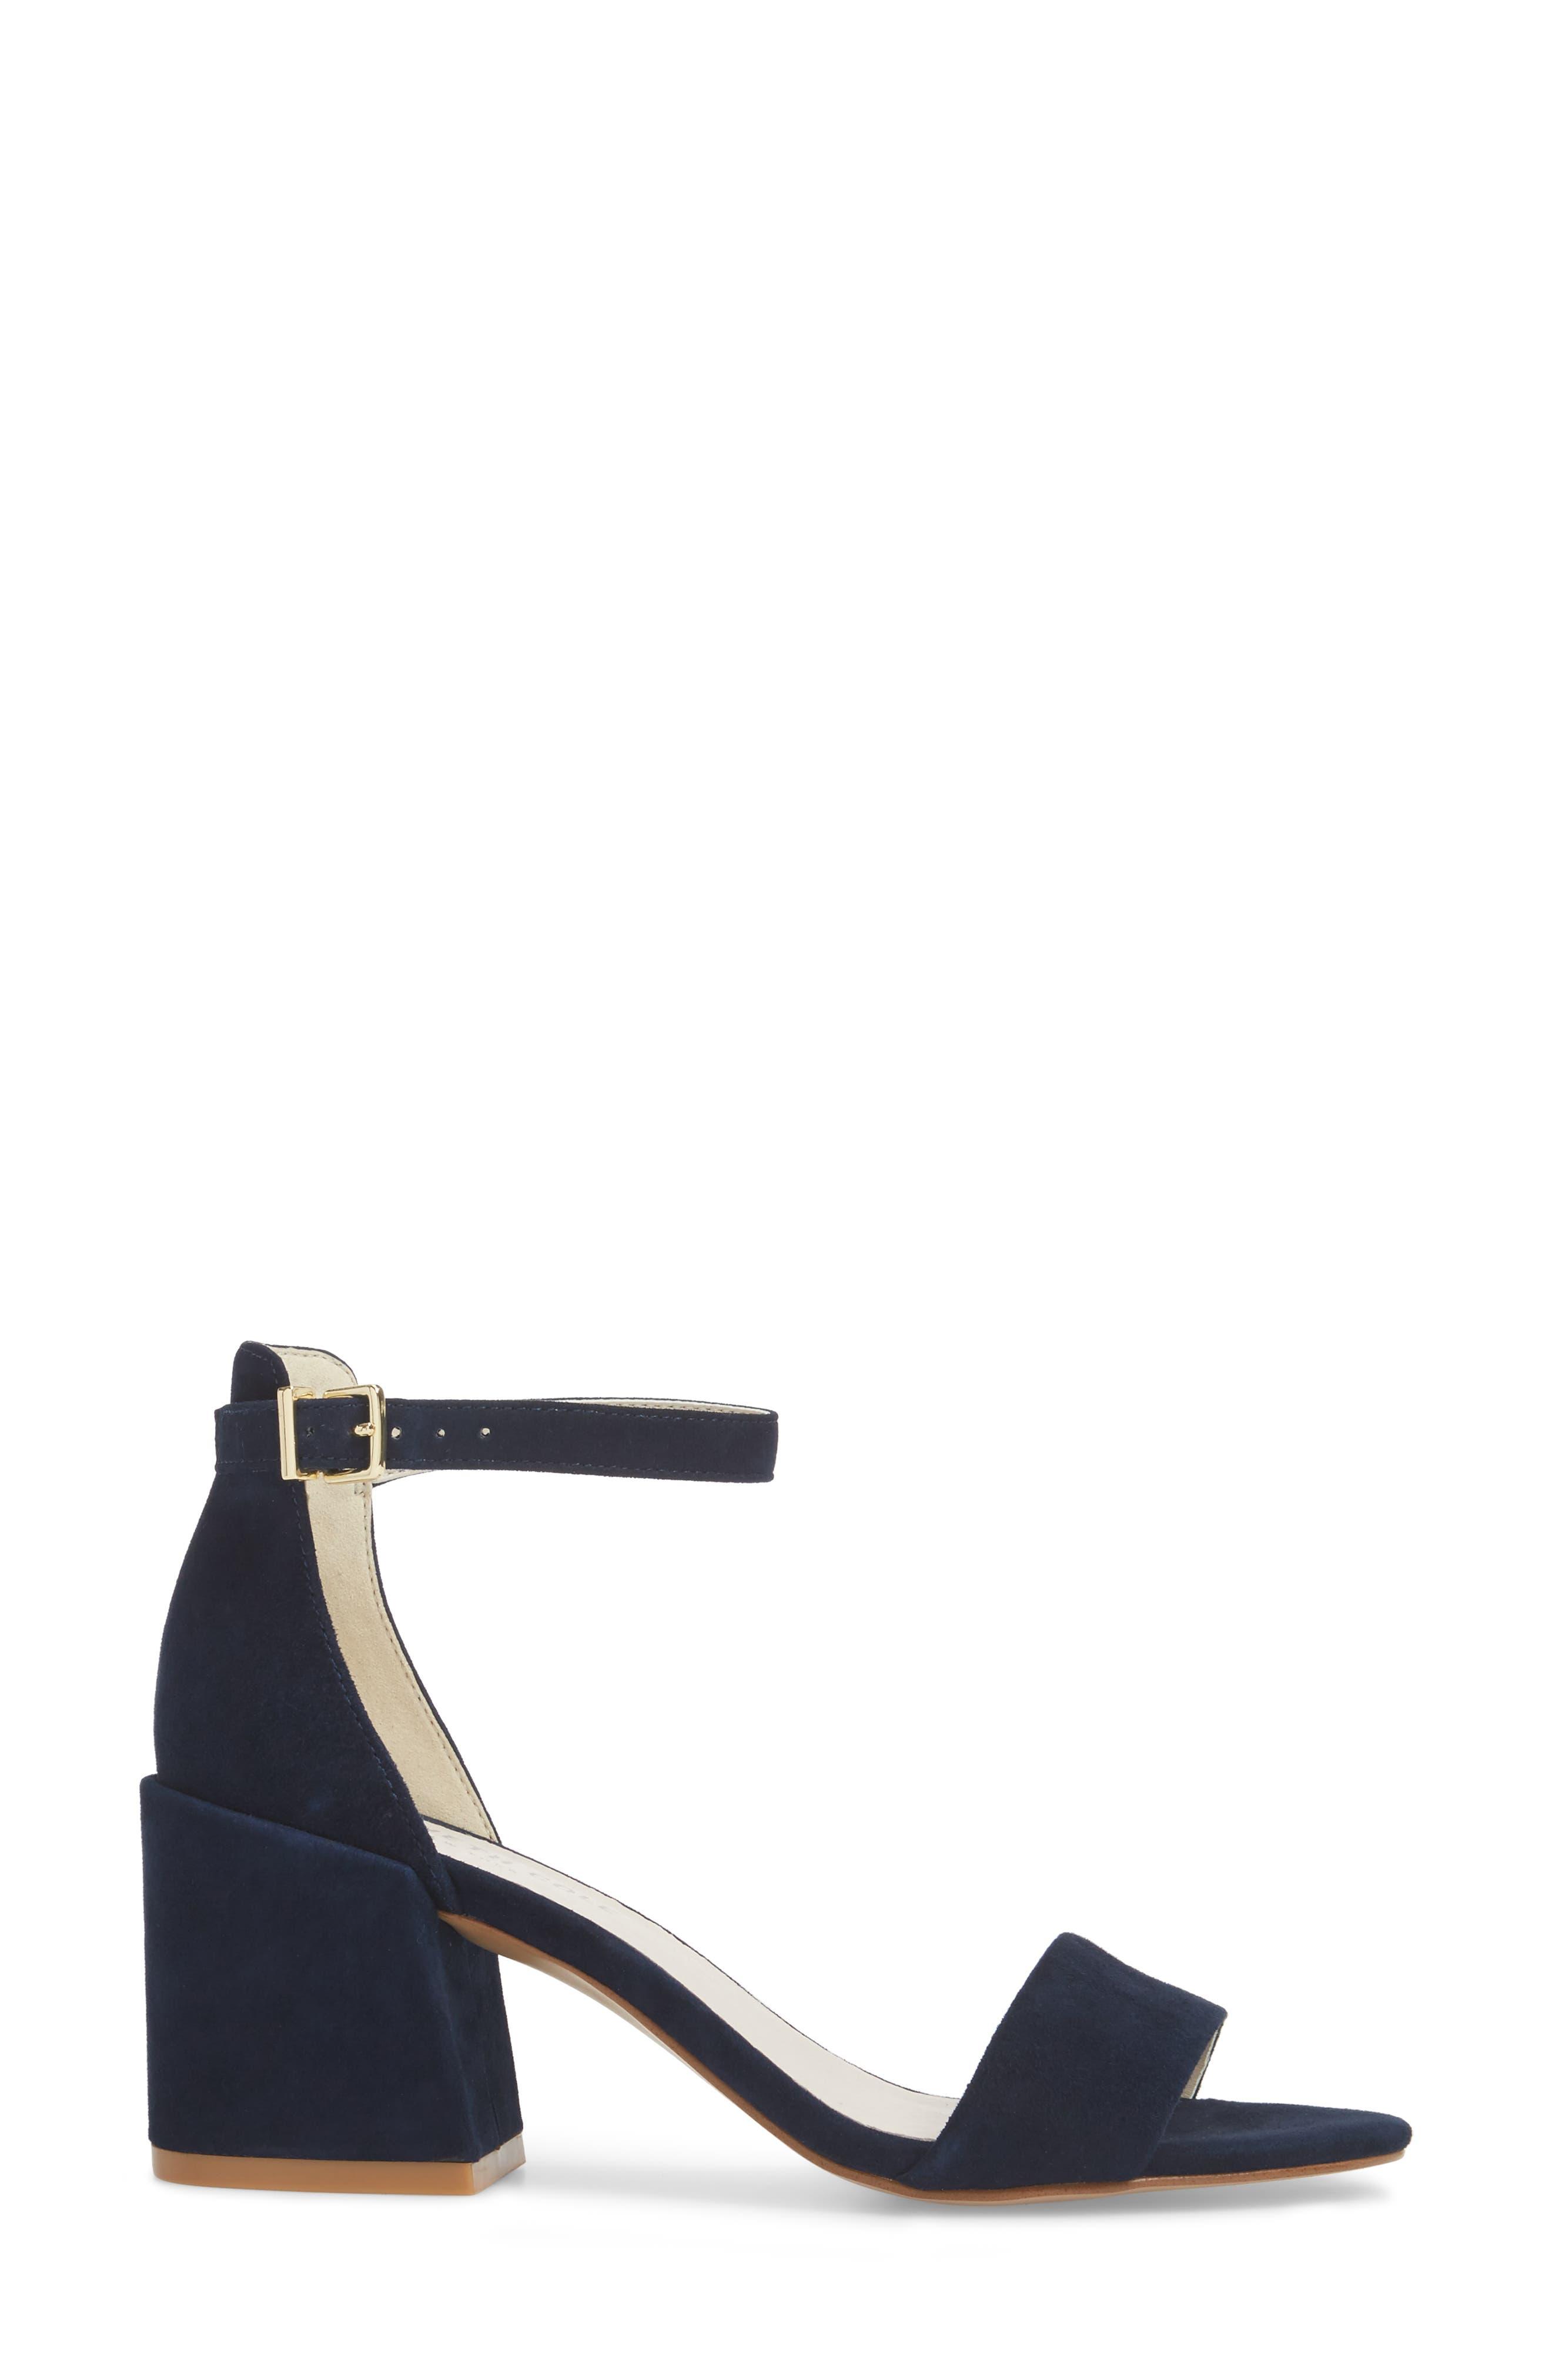 Hannon Block Heel Ankle Strap Sandal,                             Alternate thumbnail 3, color,                             Navy Suede